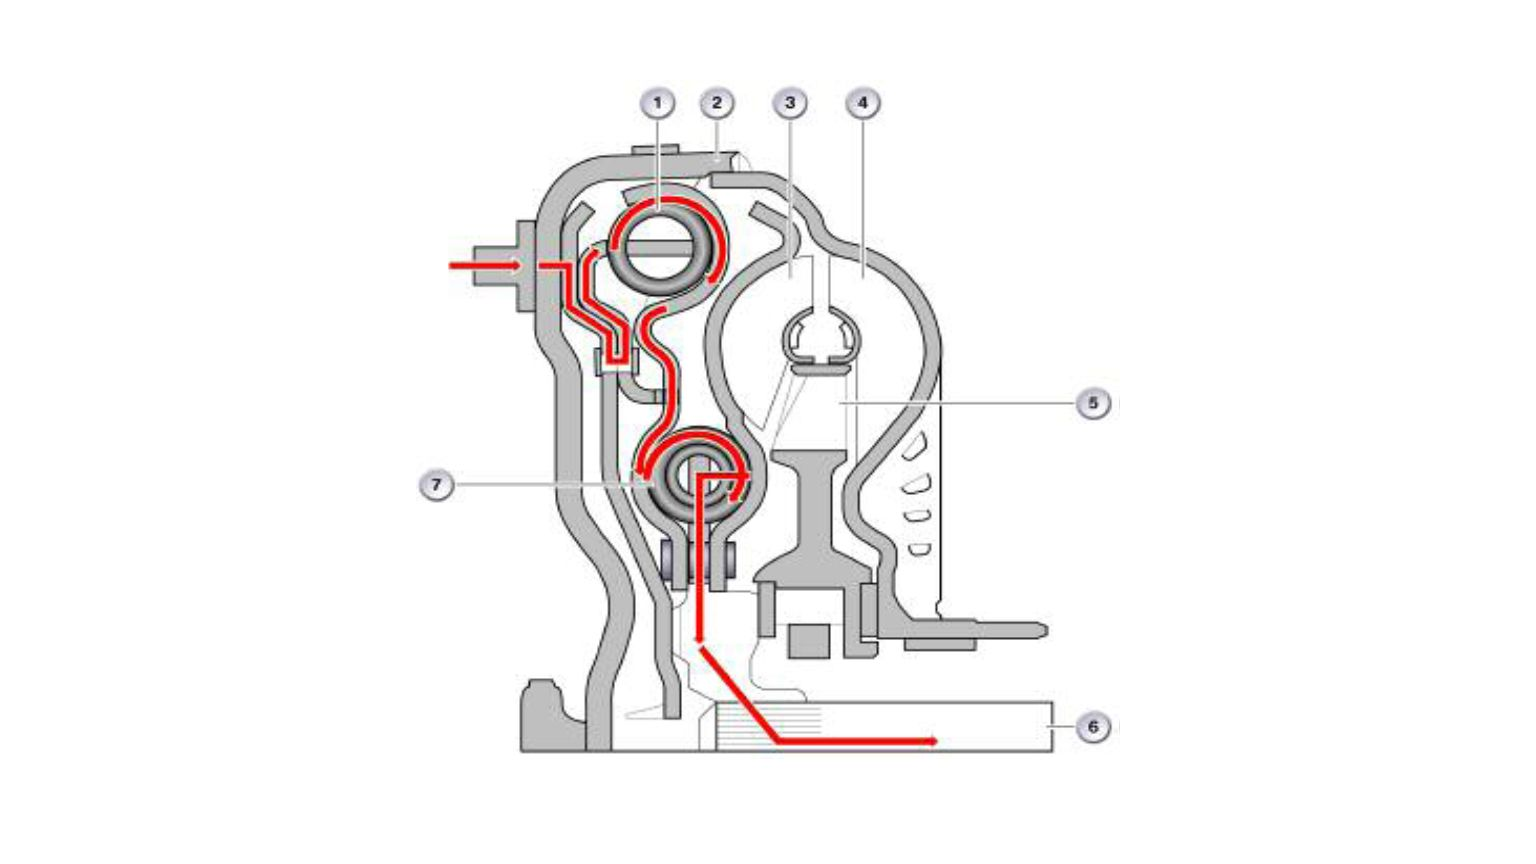 Edenpure 1000xl Wiring Diagram Wiring Diagram